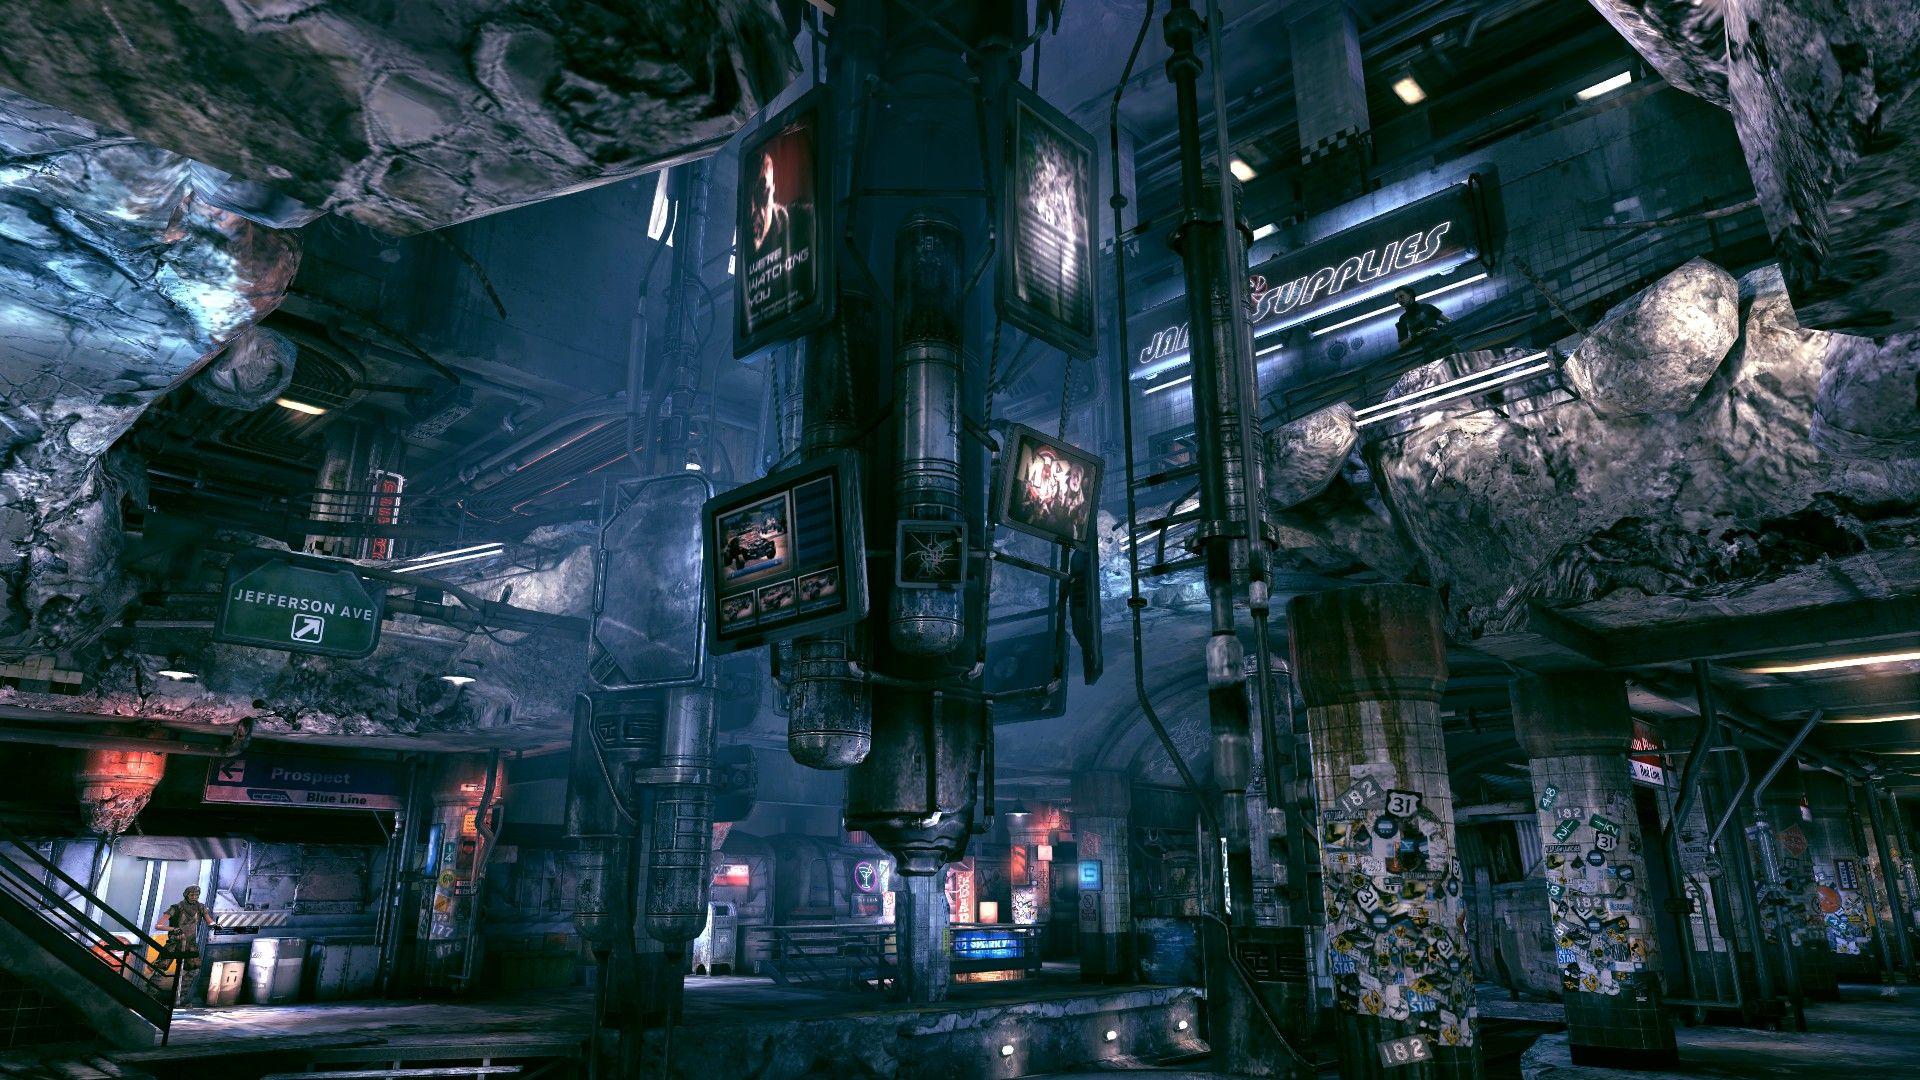 underground city - Google Search | uncategorised ...